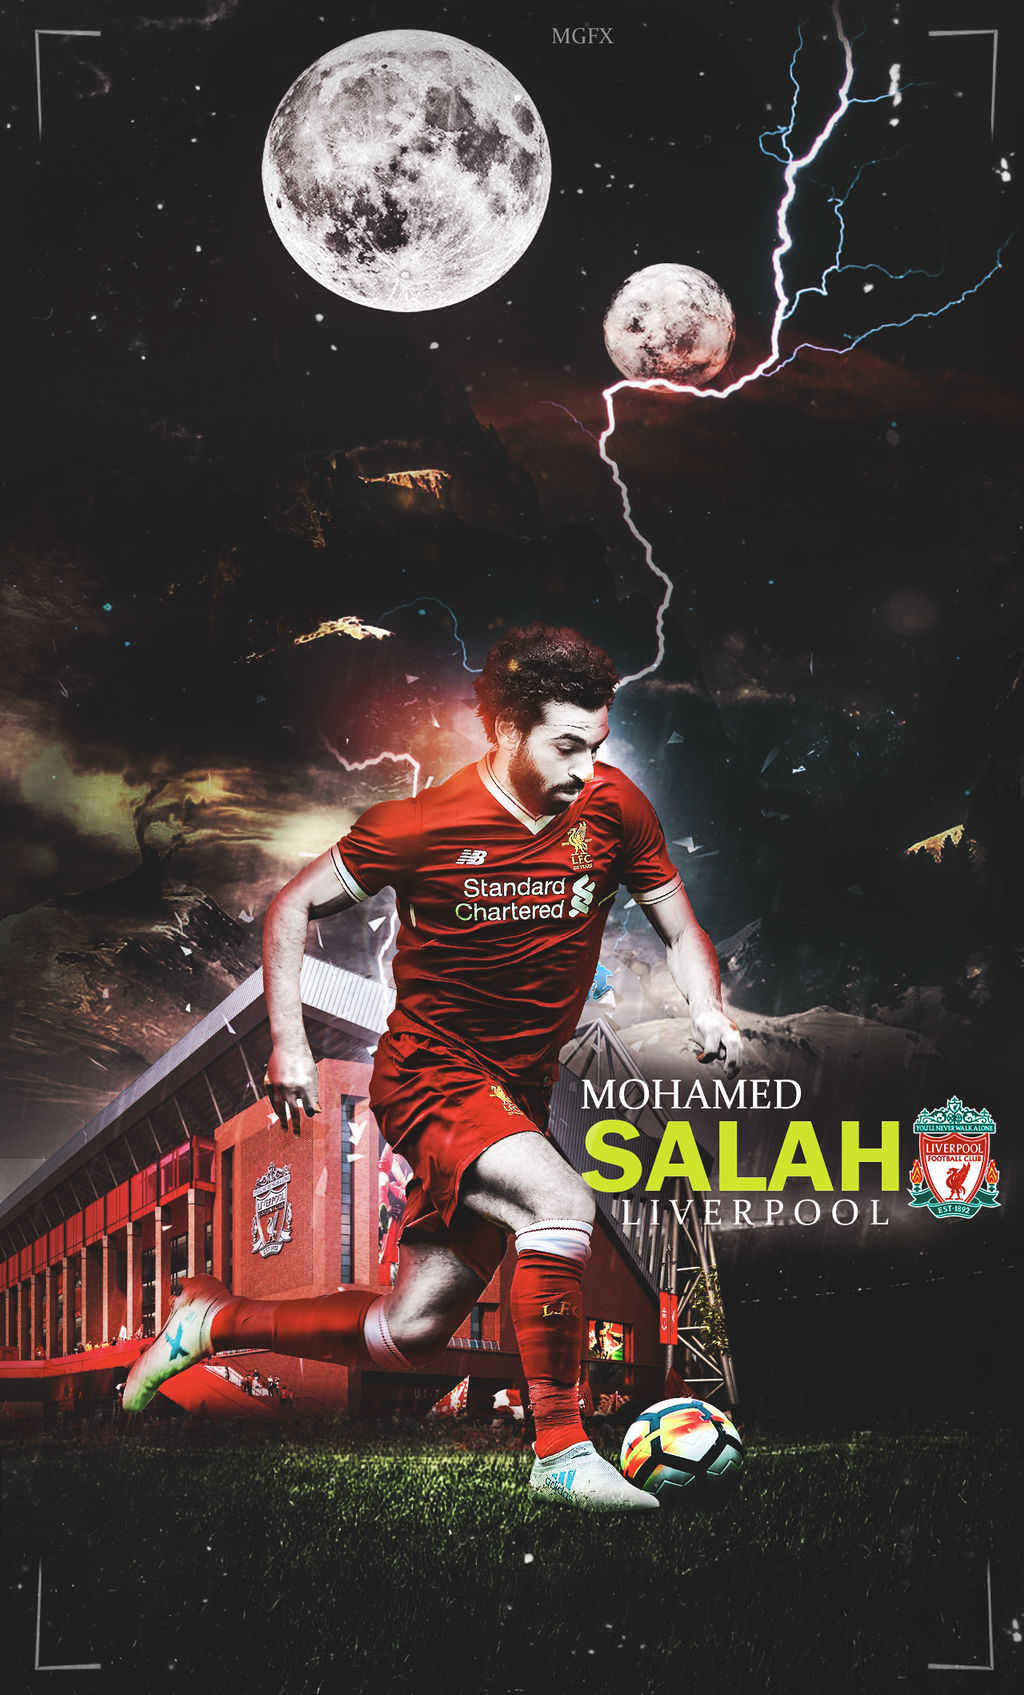 Mo Salah Wallpaper Liverpool M Phone 2018 17 By 10mohamedmahmoud On Deviantart